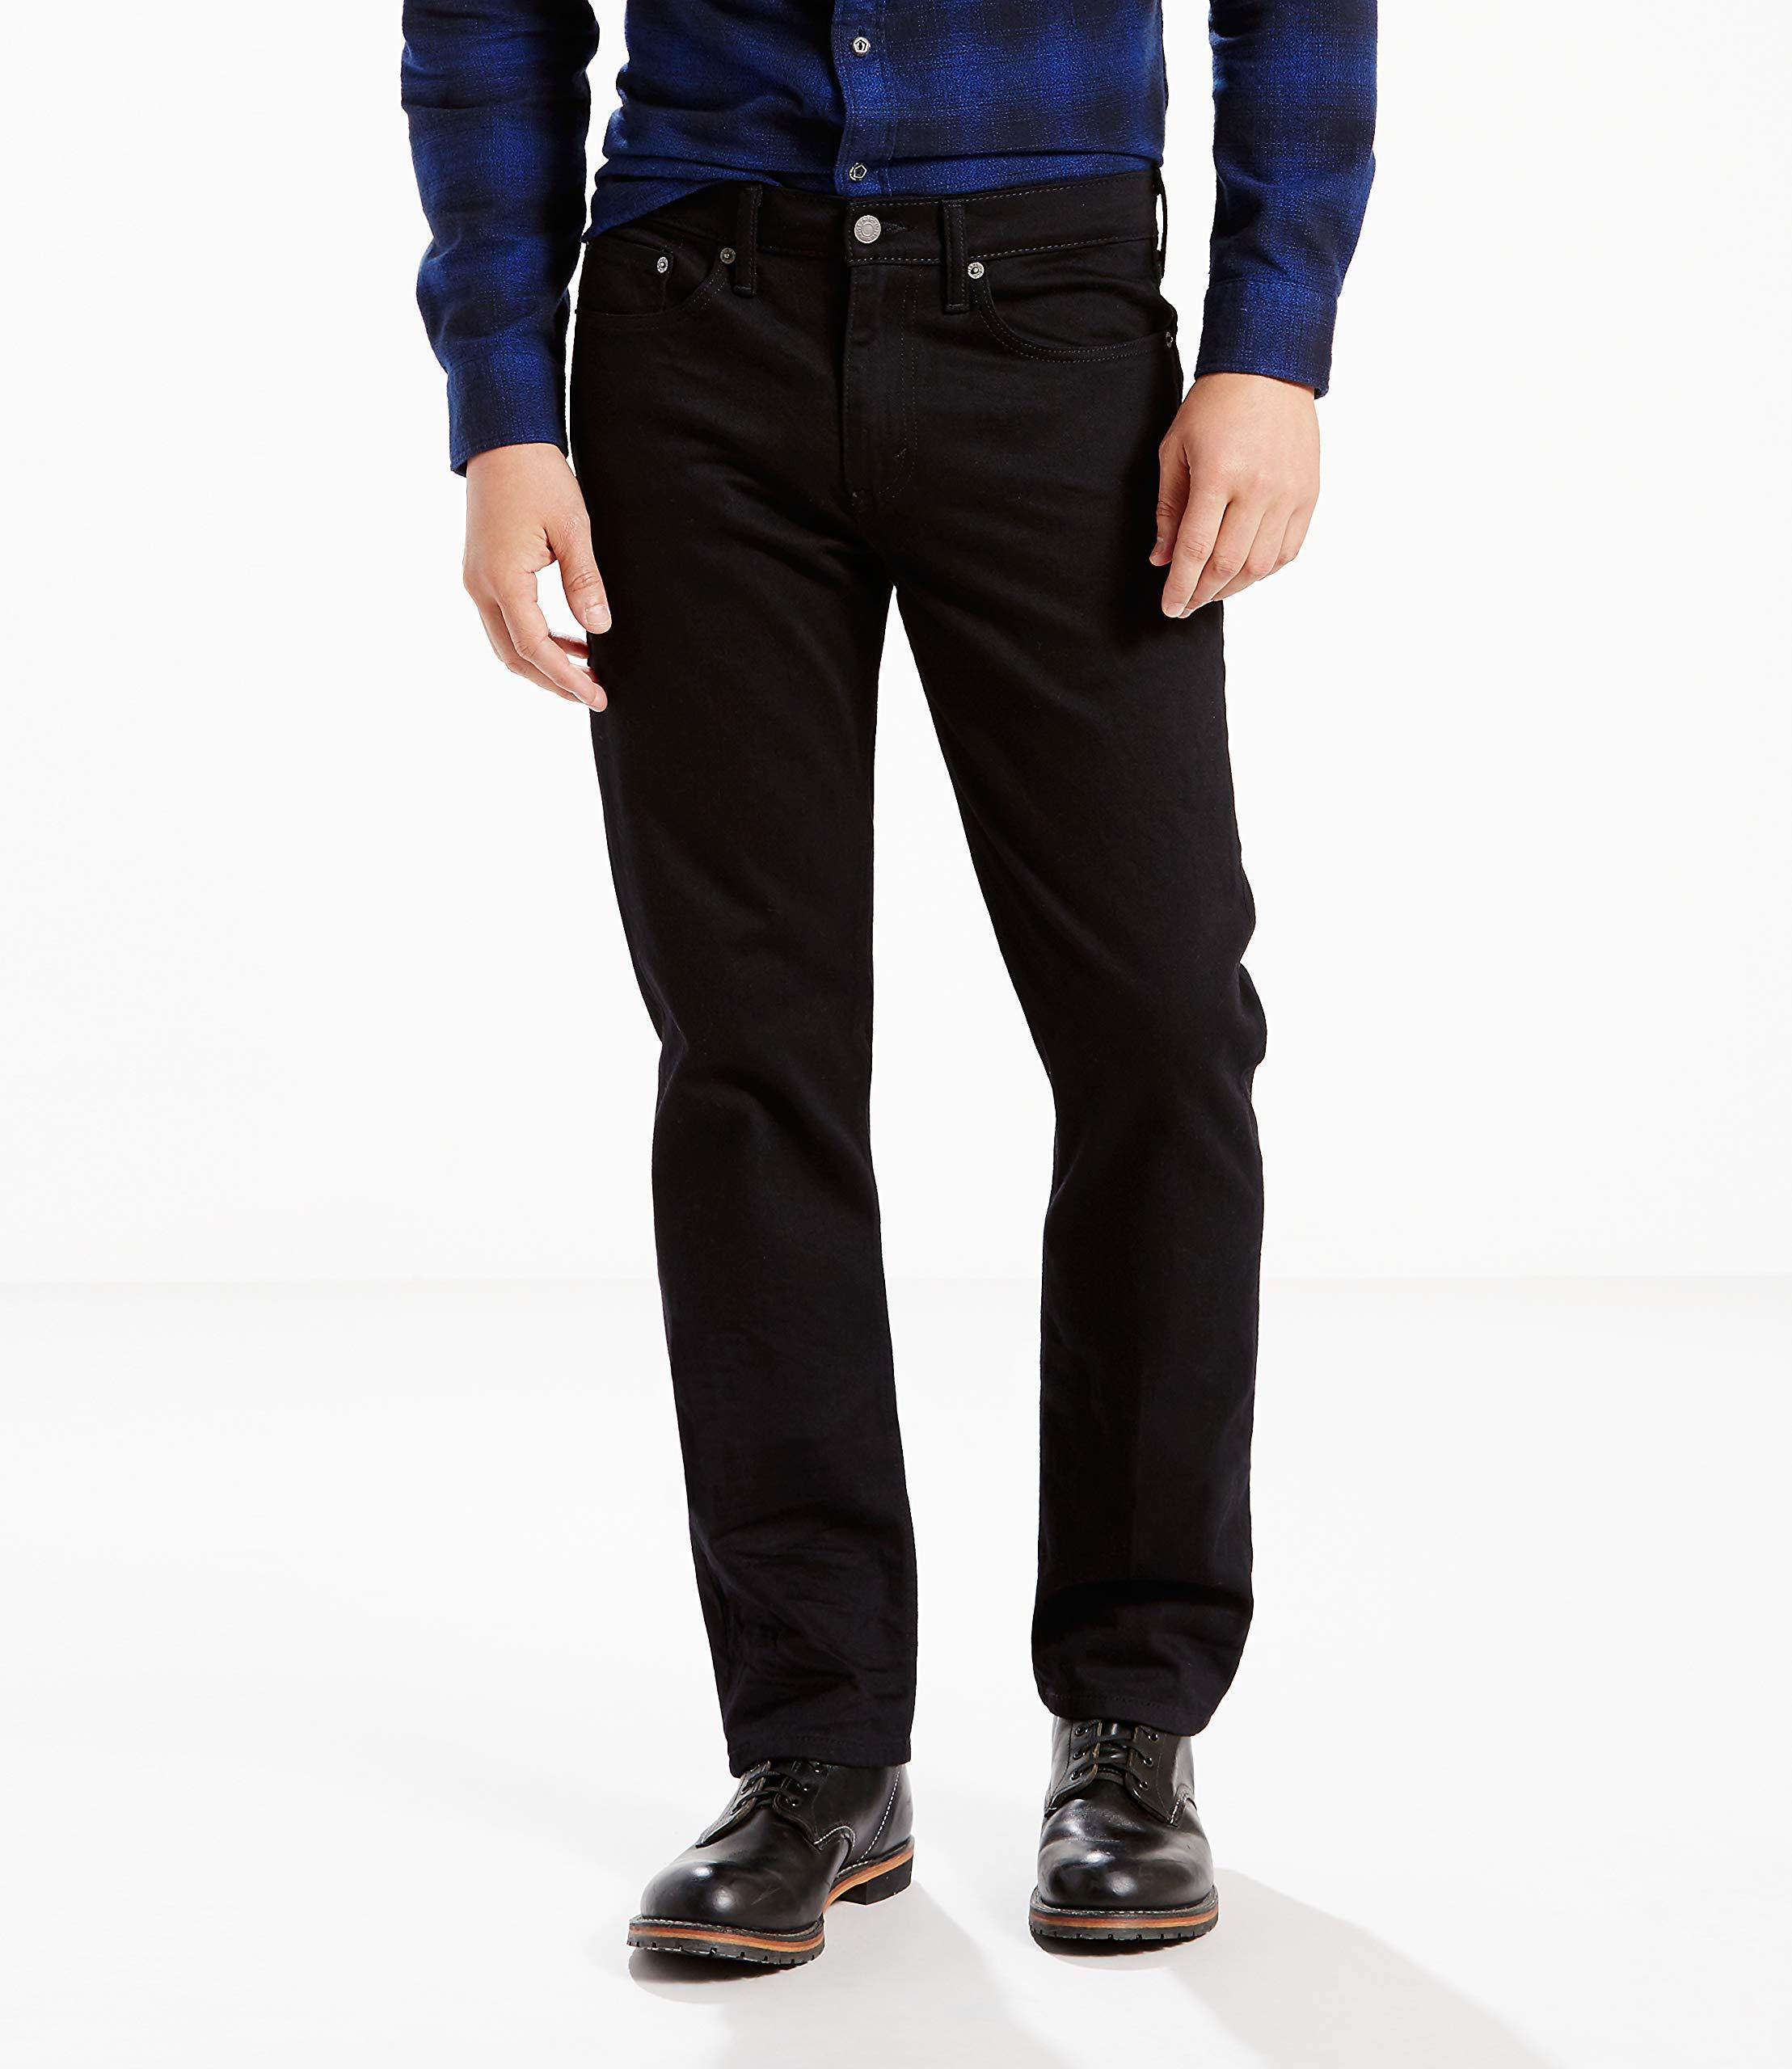 Levi's Men's 514 Straight fit Stretch Jean,  Black, 32x32